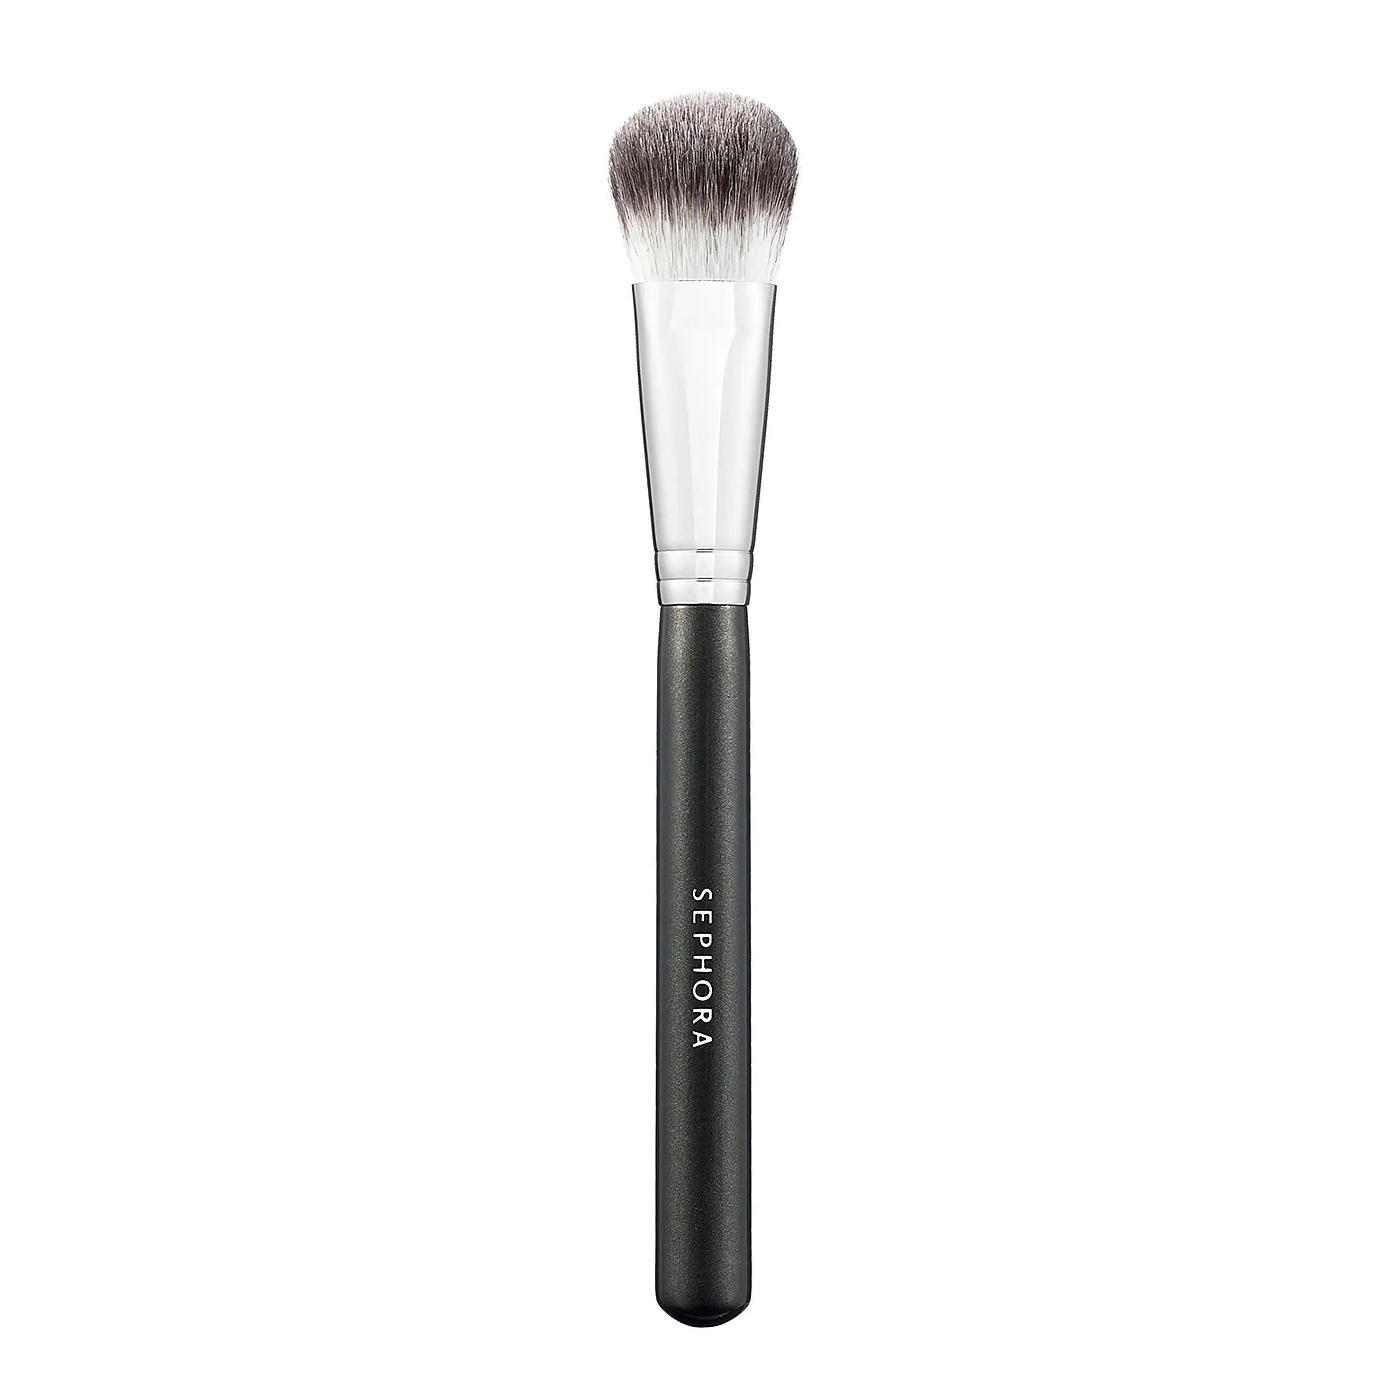 Sephora Airbrush Precision Foundation Brush